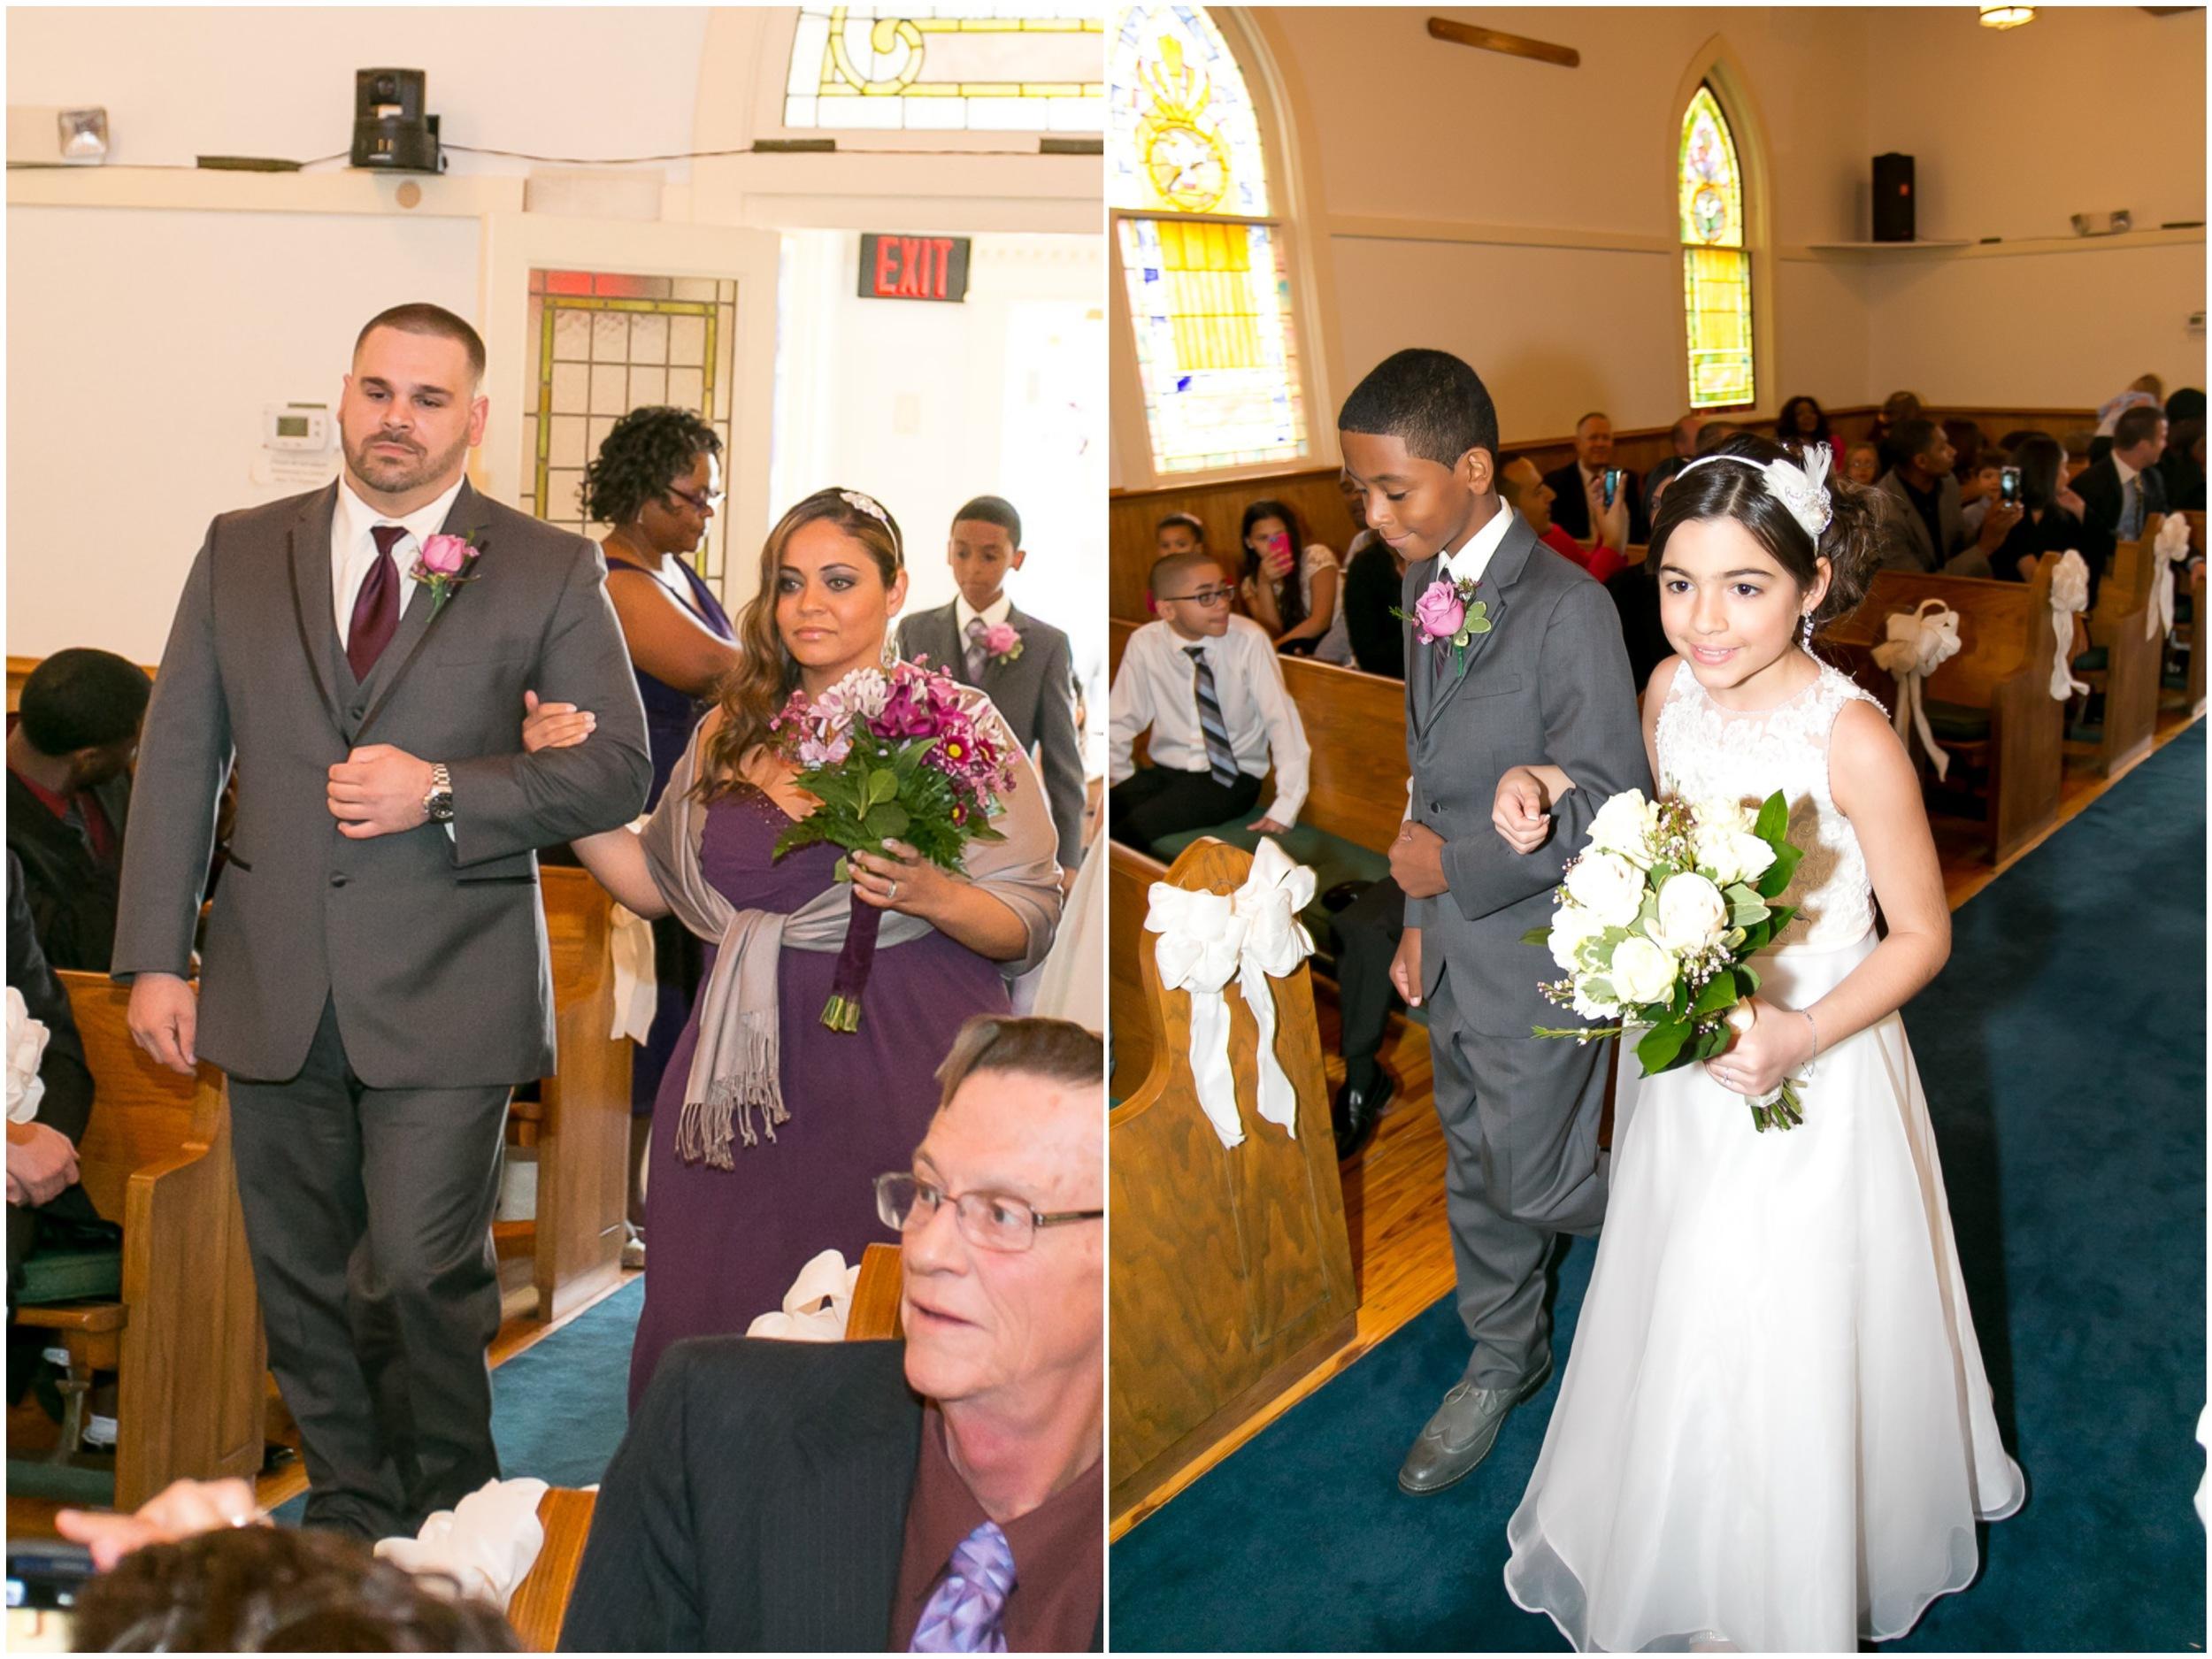 Bradly-and-Jesenia-Wedding-Collage-14.jpg